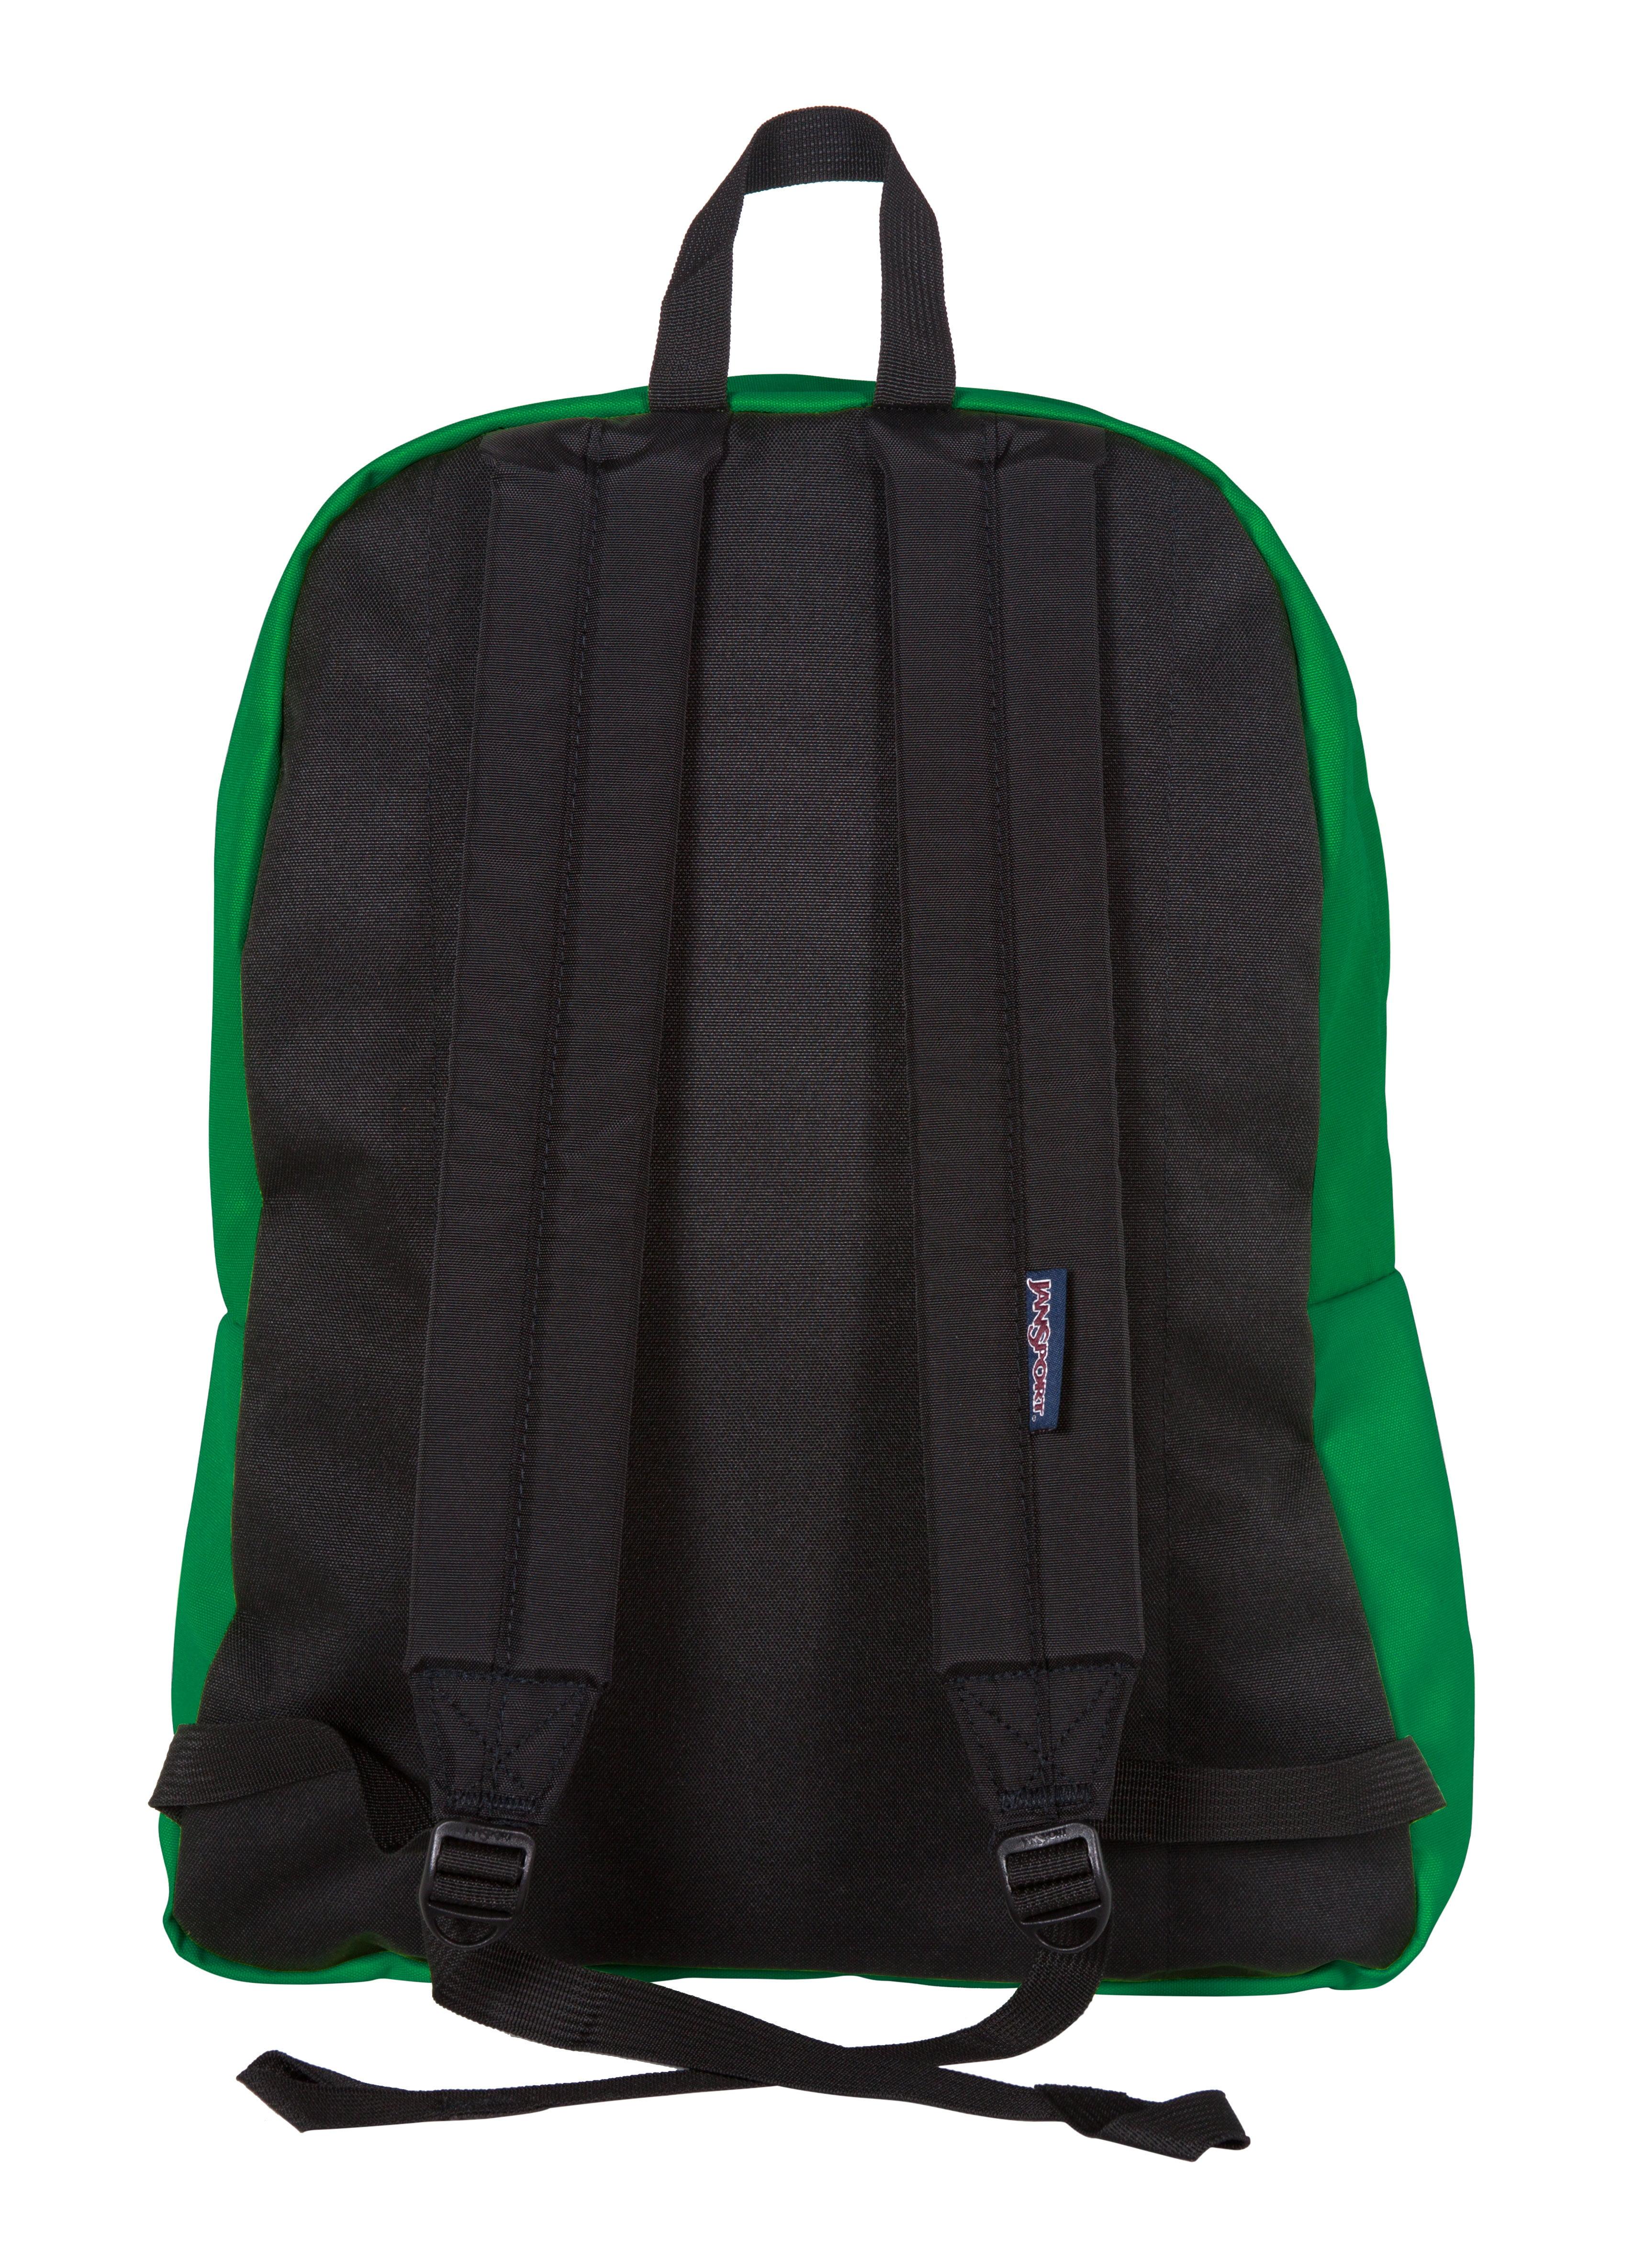 Jansport Superbreak Backpack Amazon Green - Walmart.com b47f9f8fcd381